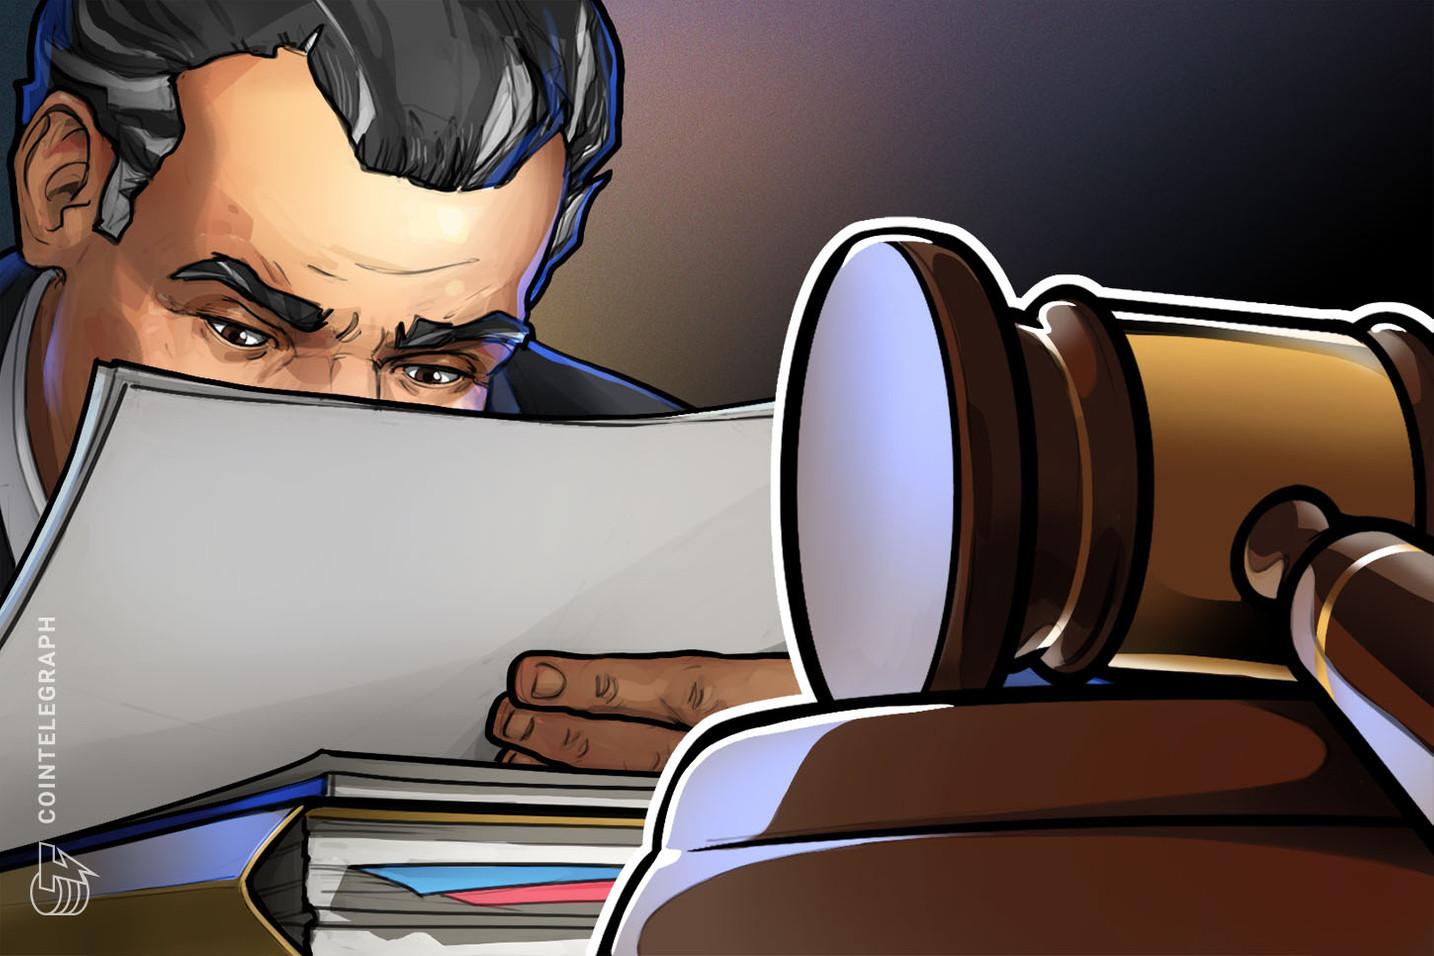 Bivši radnik u Krakenu tuži berzu za 'neetičke i ilegalne poslovne taktike'